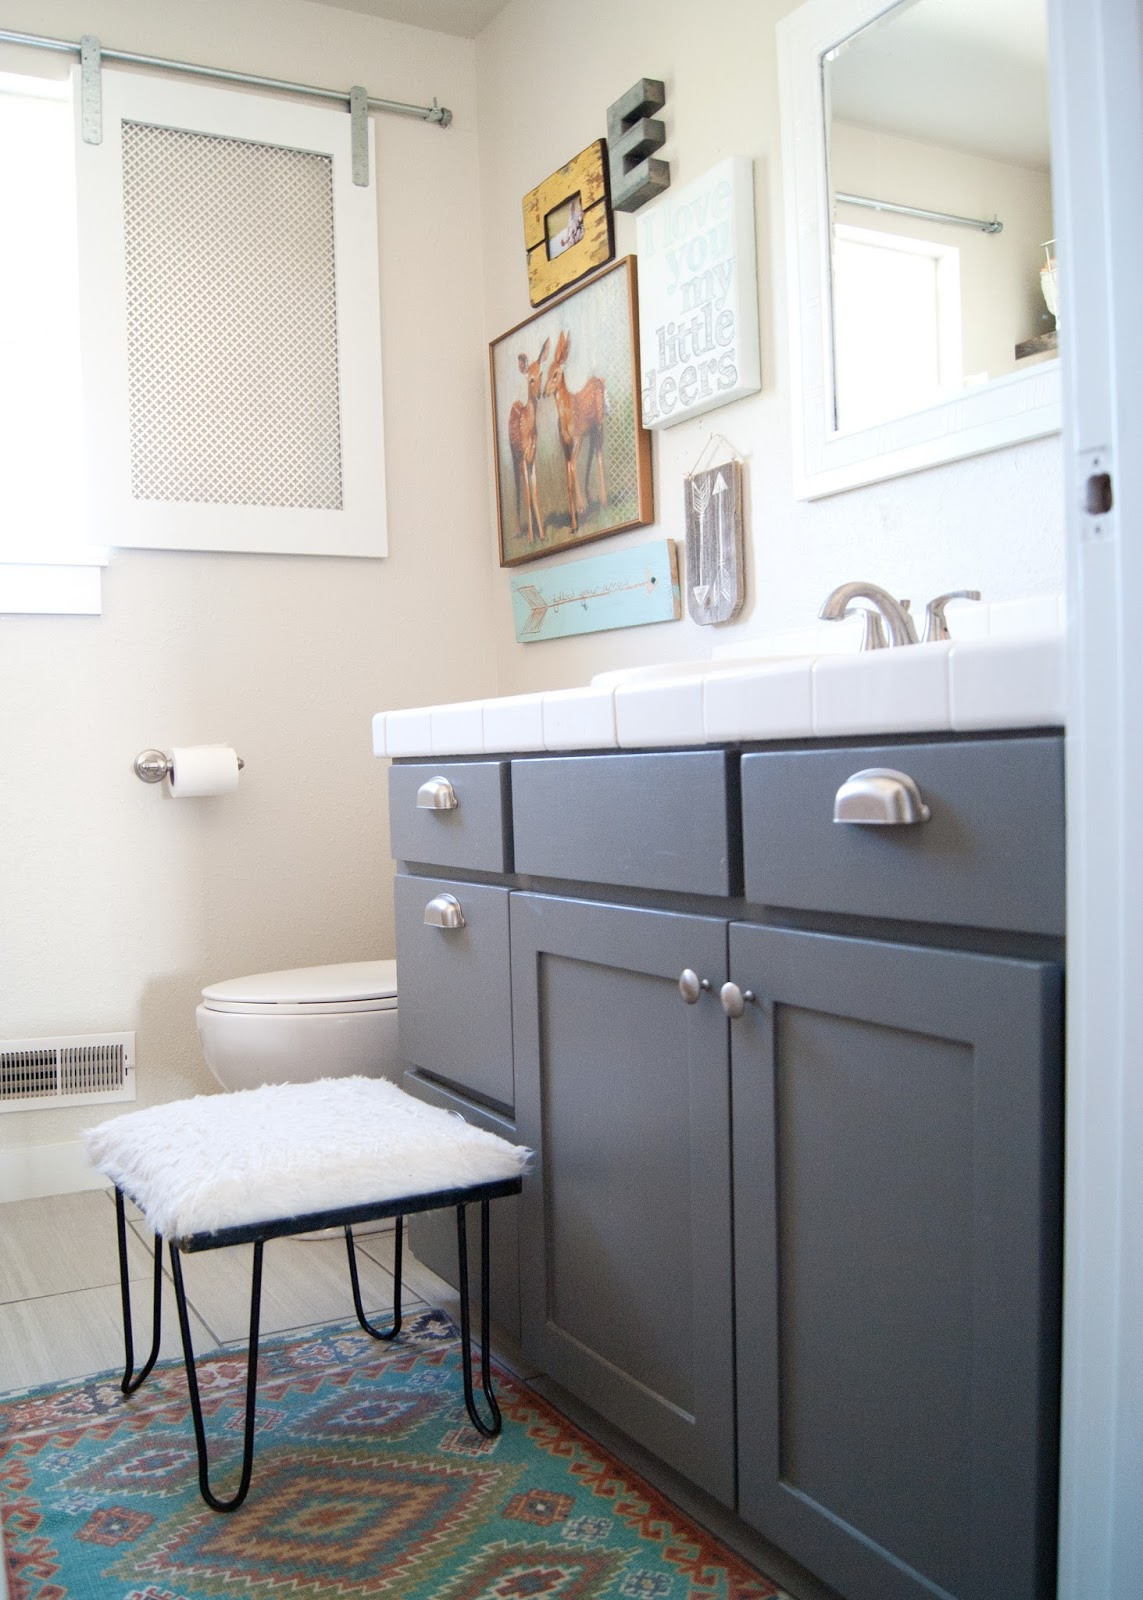 Project Kid 39 S Bathroom Reveal Averie Lane Project Kid 39 S Bathroo